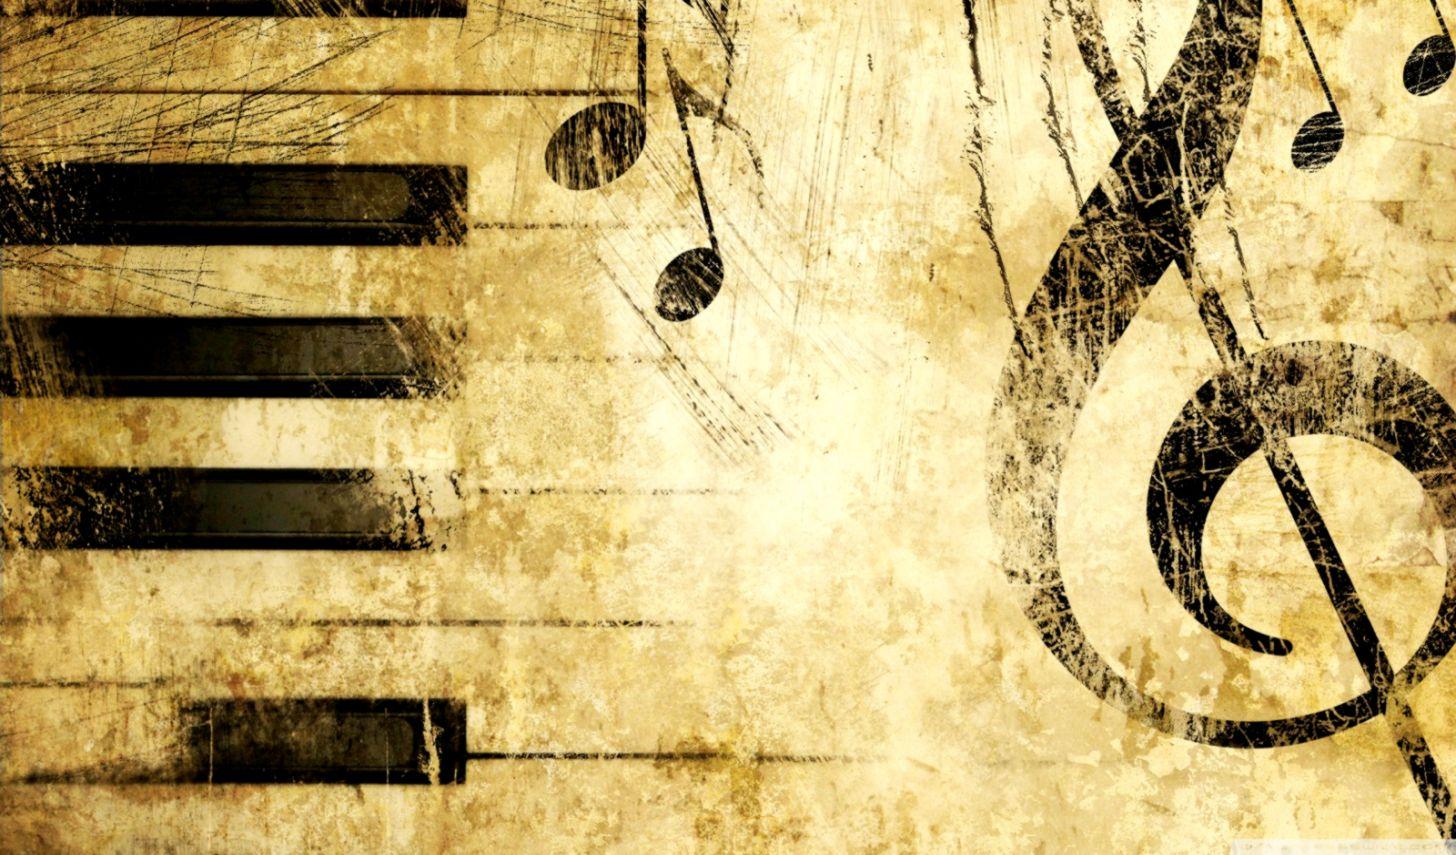 High Resolution 4k Wallpaper Music